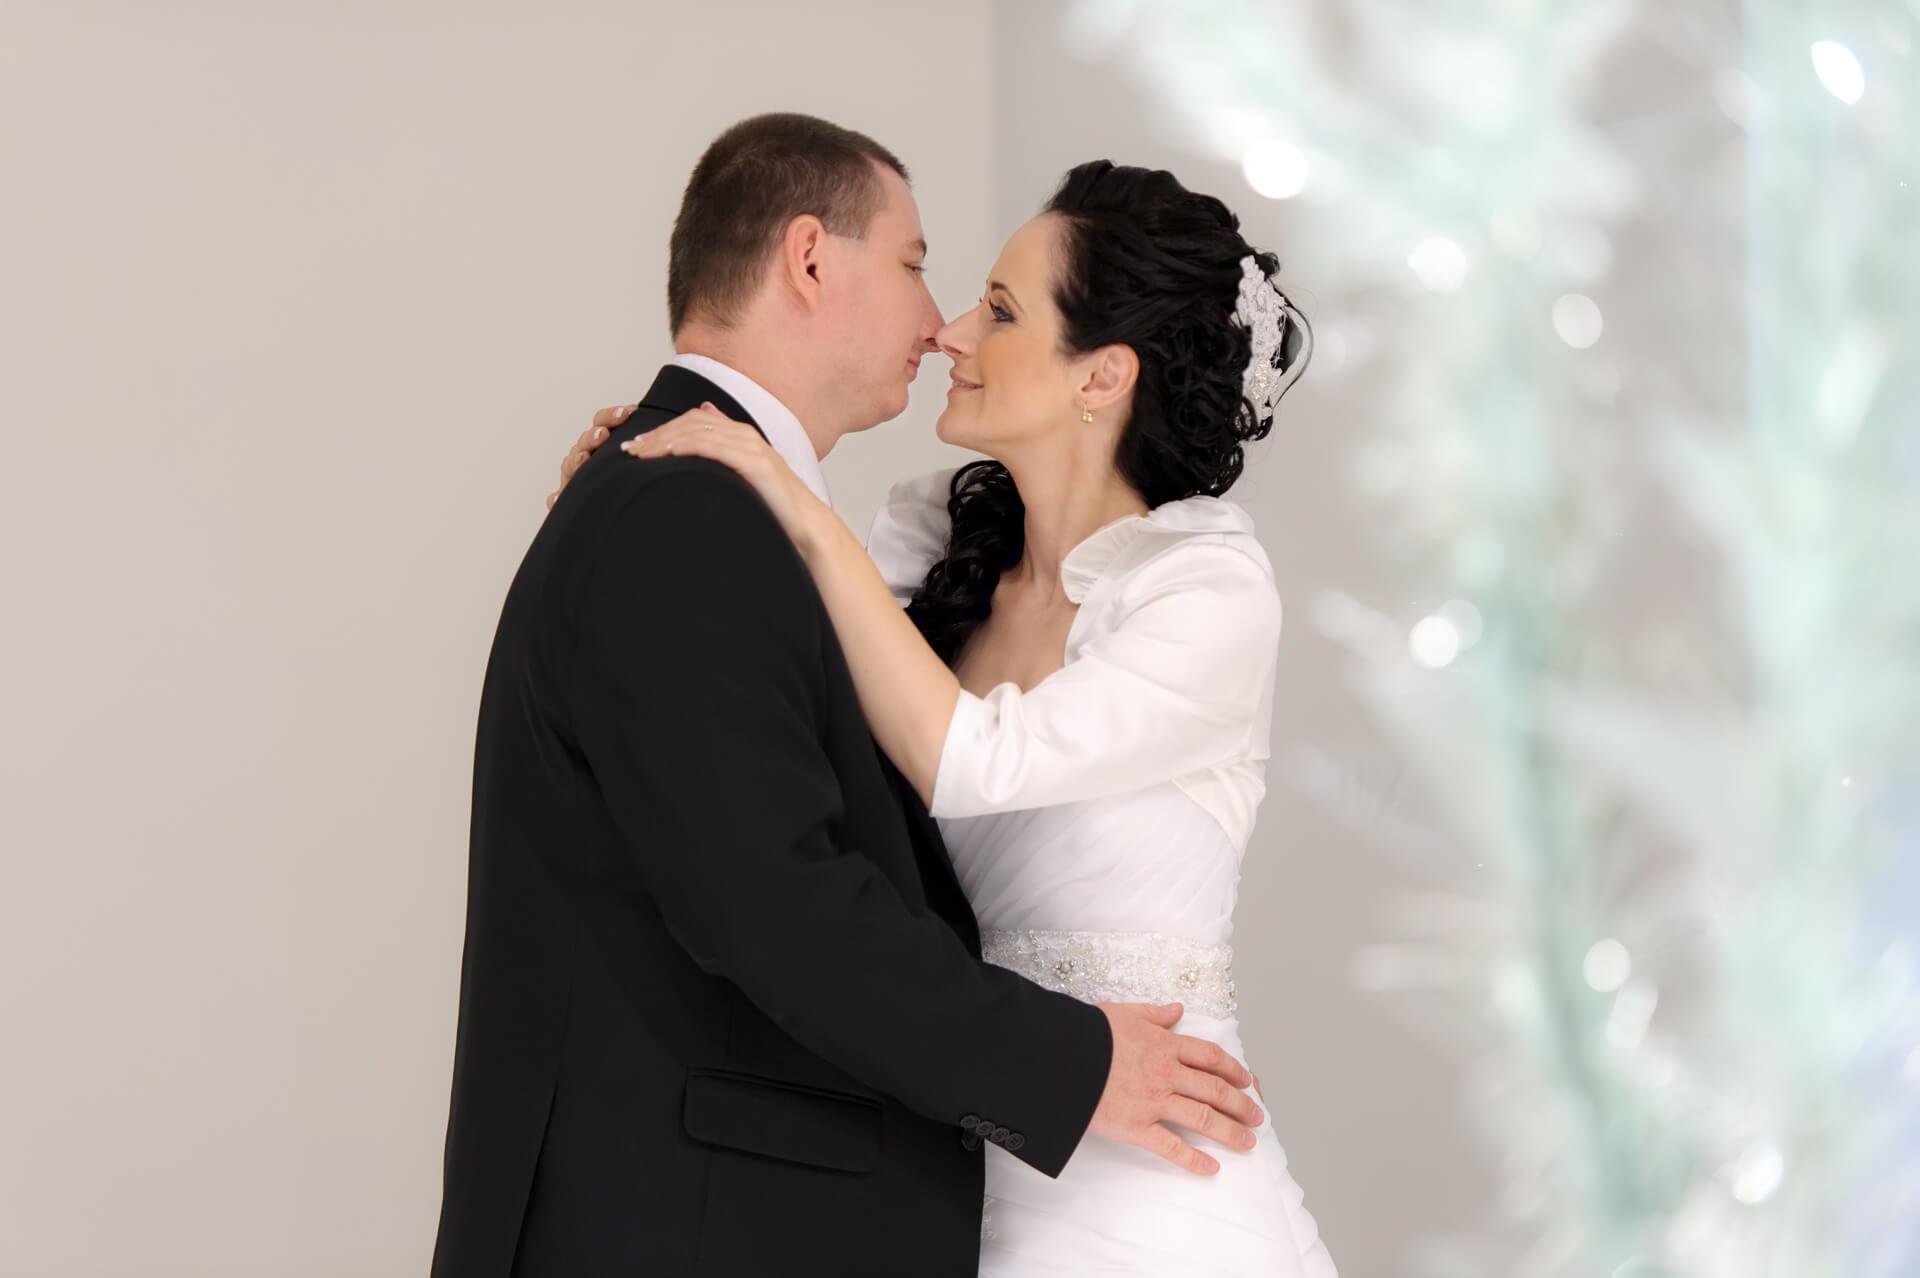 svadba svadobny portrety profesionalne fotenie fotograf Peter Norulak Kosice__31